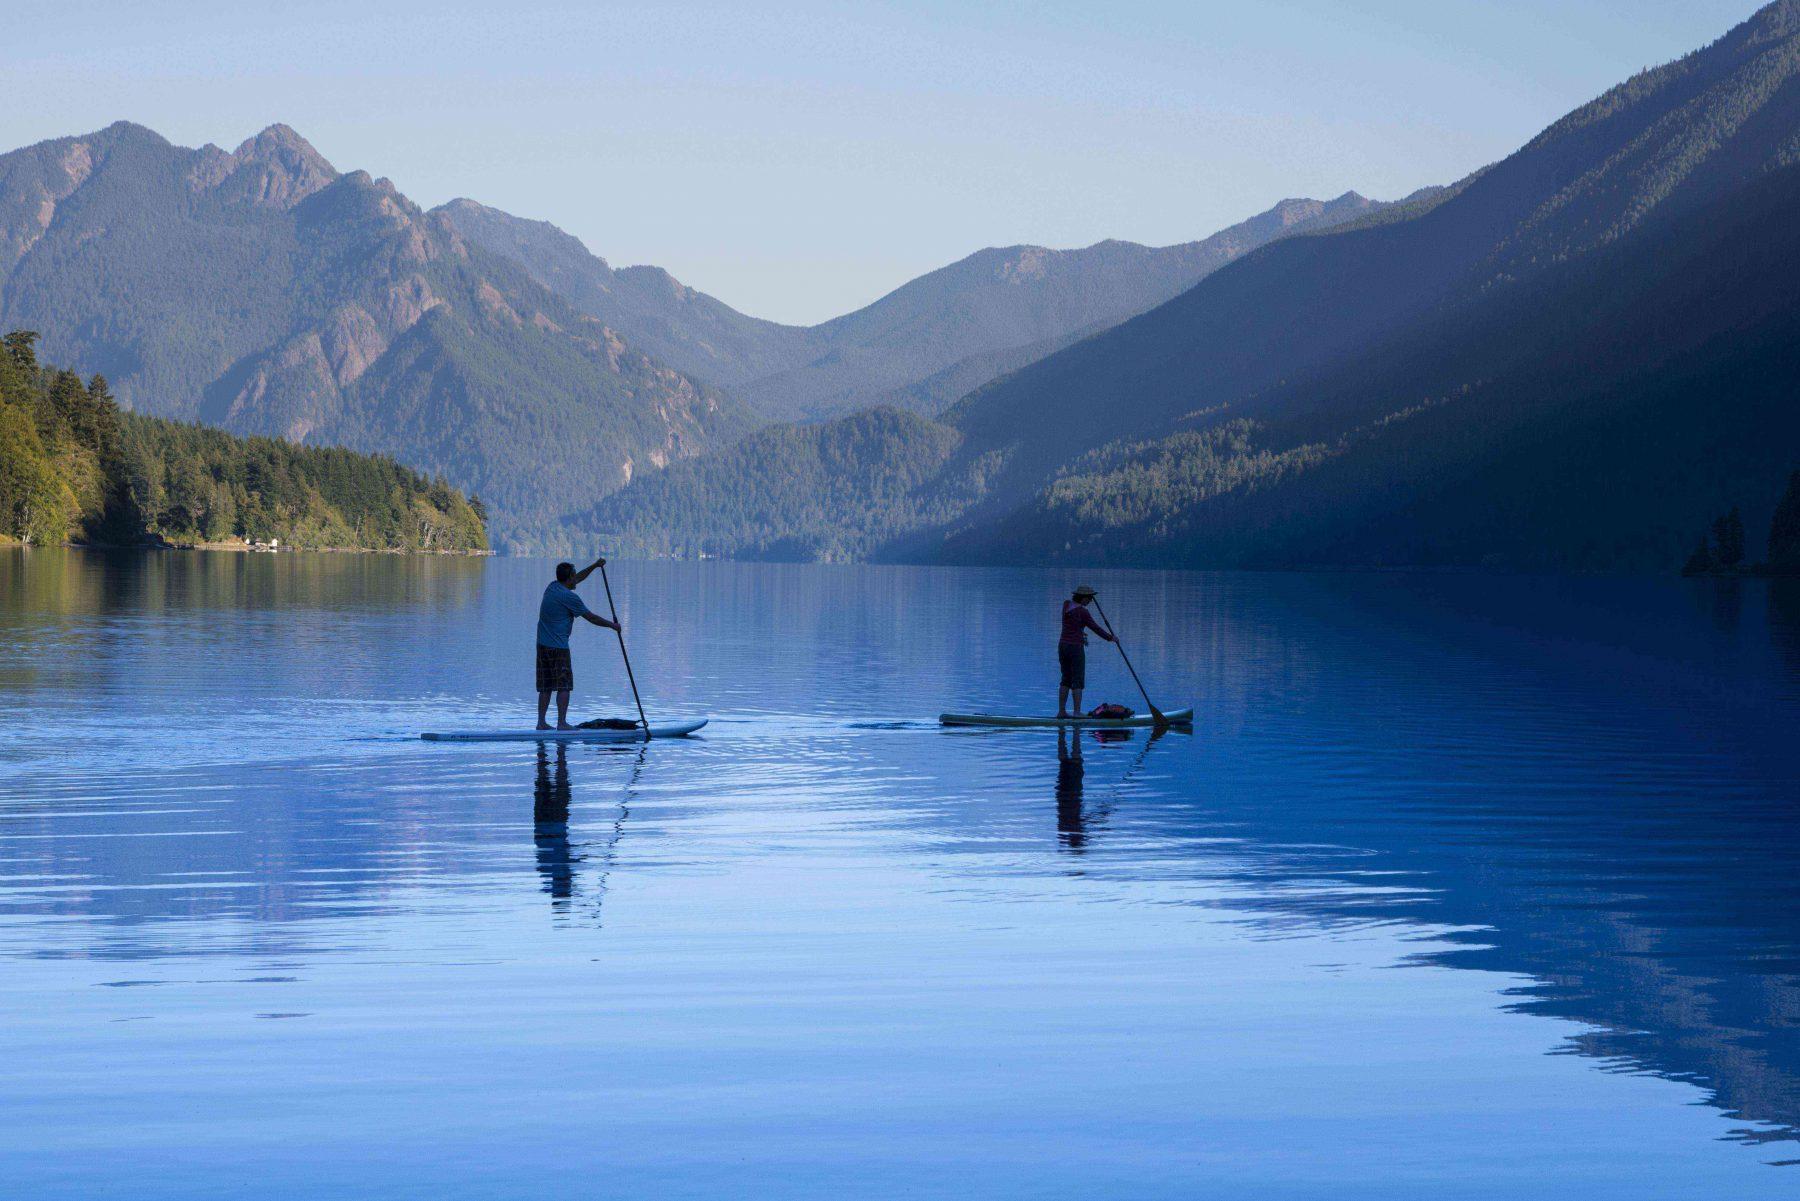 Stand Up Paddle Boards >> Stand Up Paddle Board Rentals | Sierra Nevada Adventure Co.